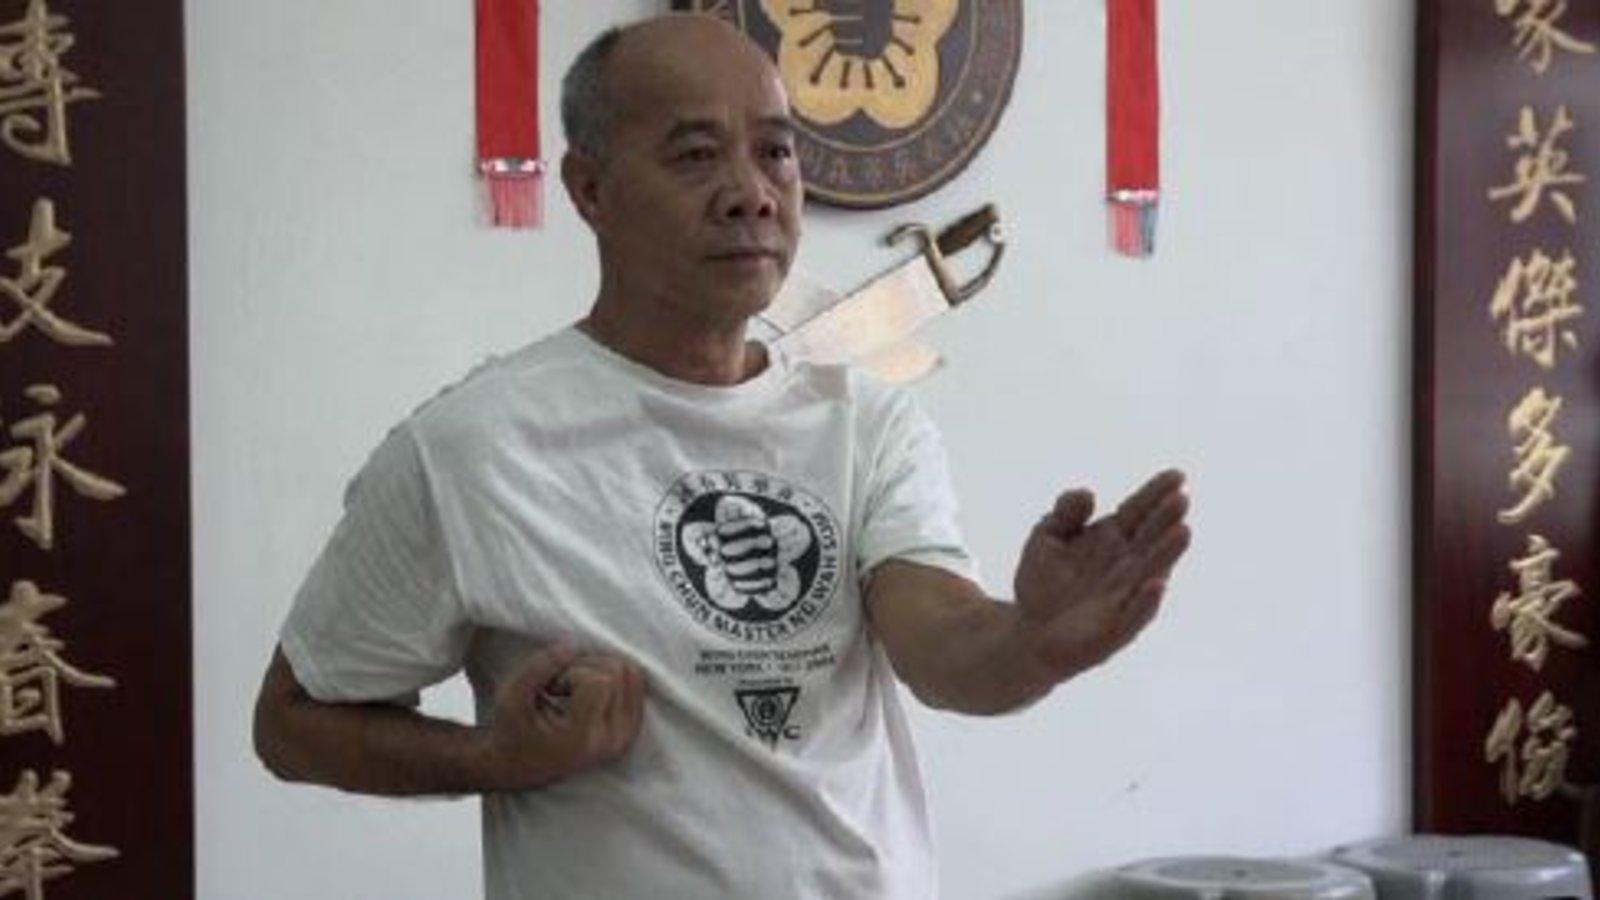 Wing Chun: A Documentary